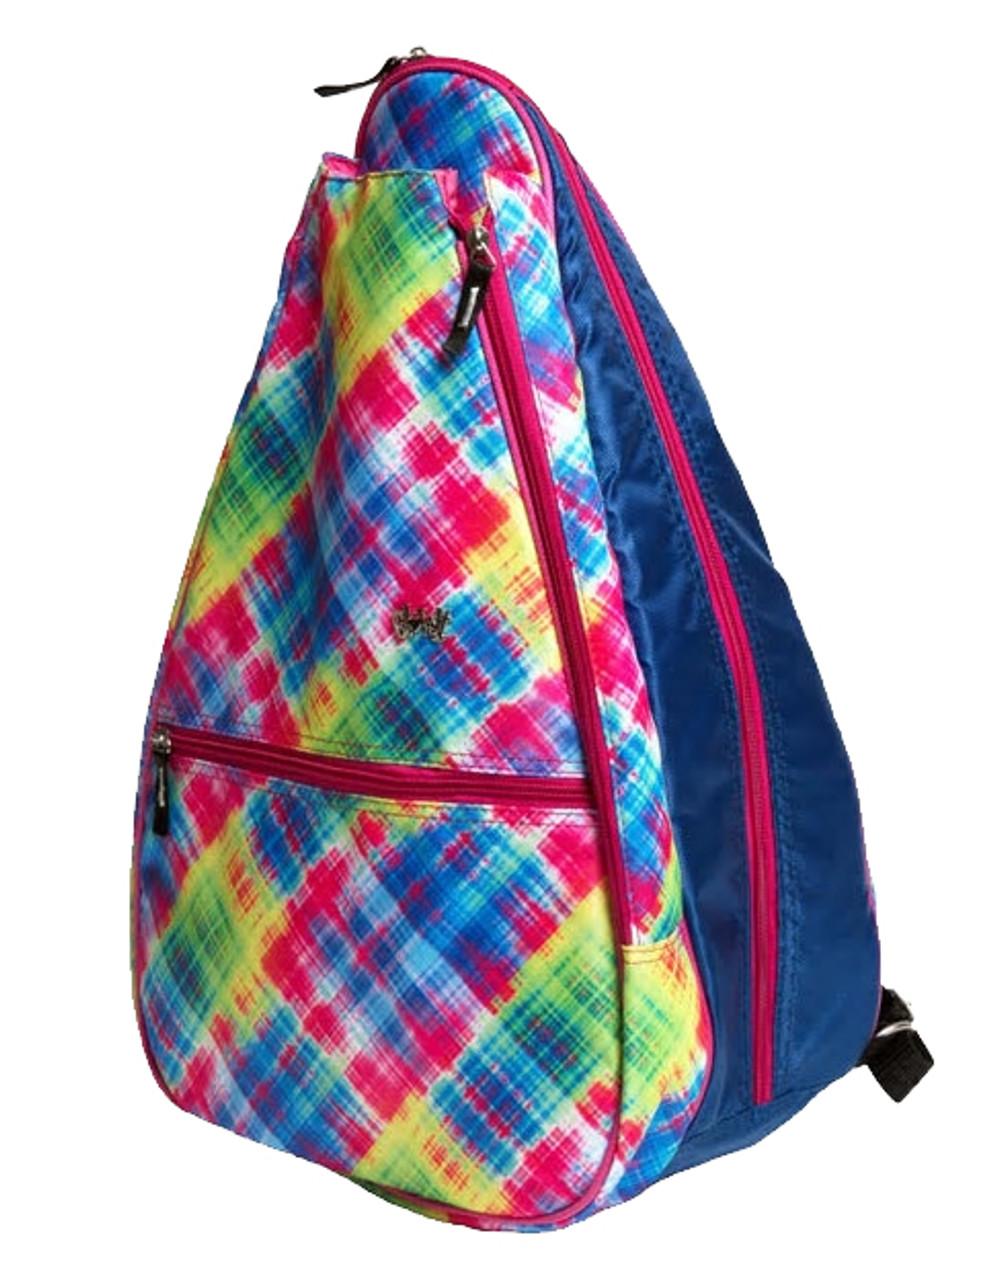 b70e798474 Glove It Women s Electric Plaid Tennis Backpack